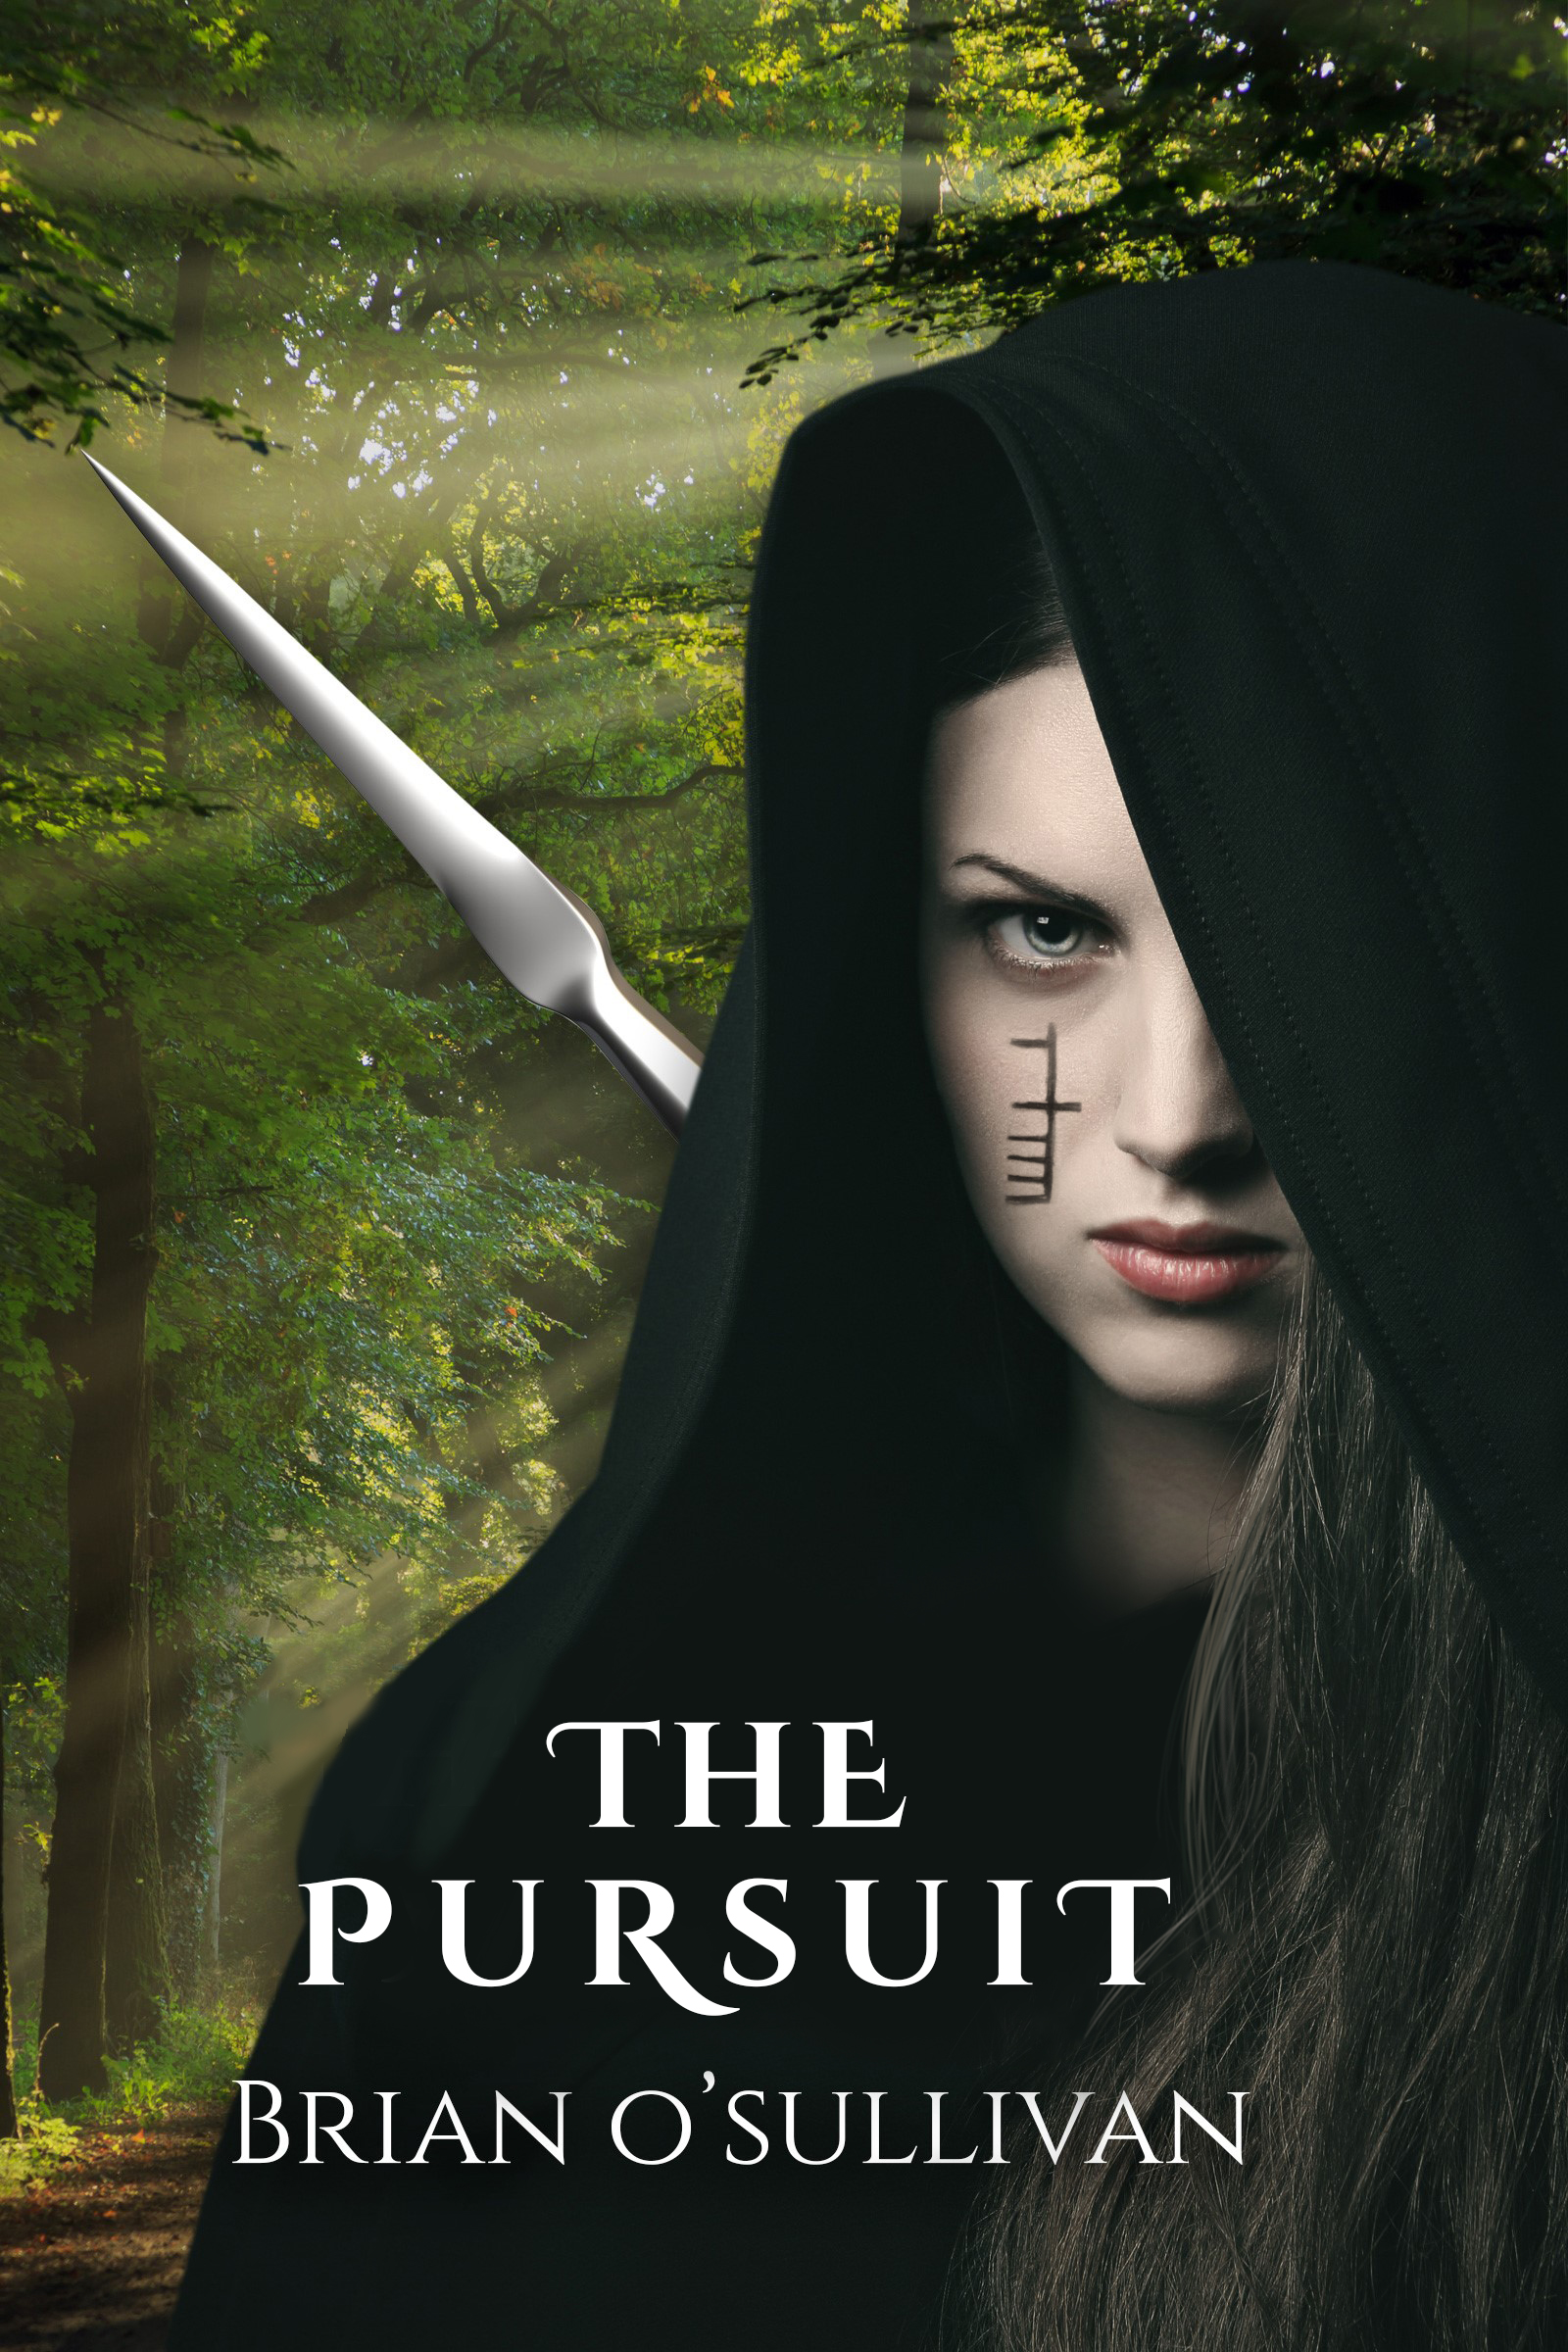 Liath Luachra: The Pursuit